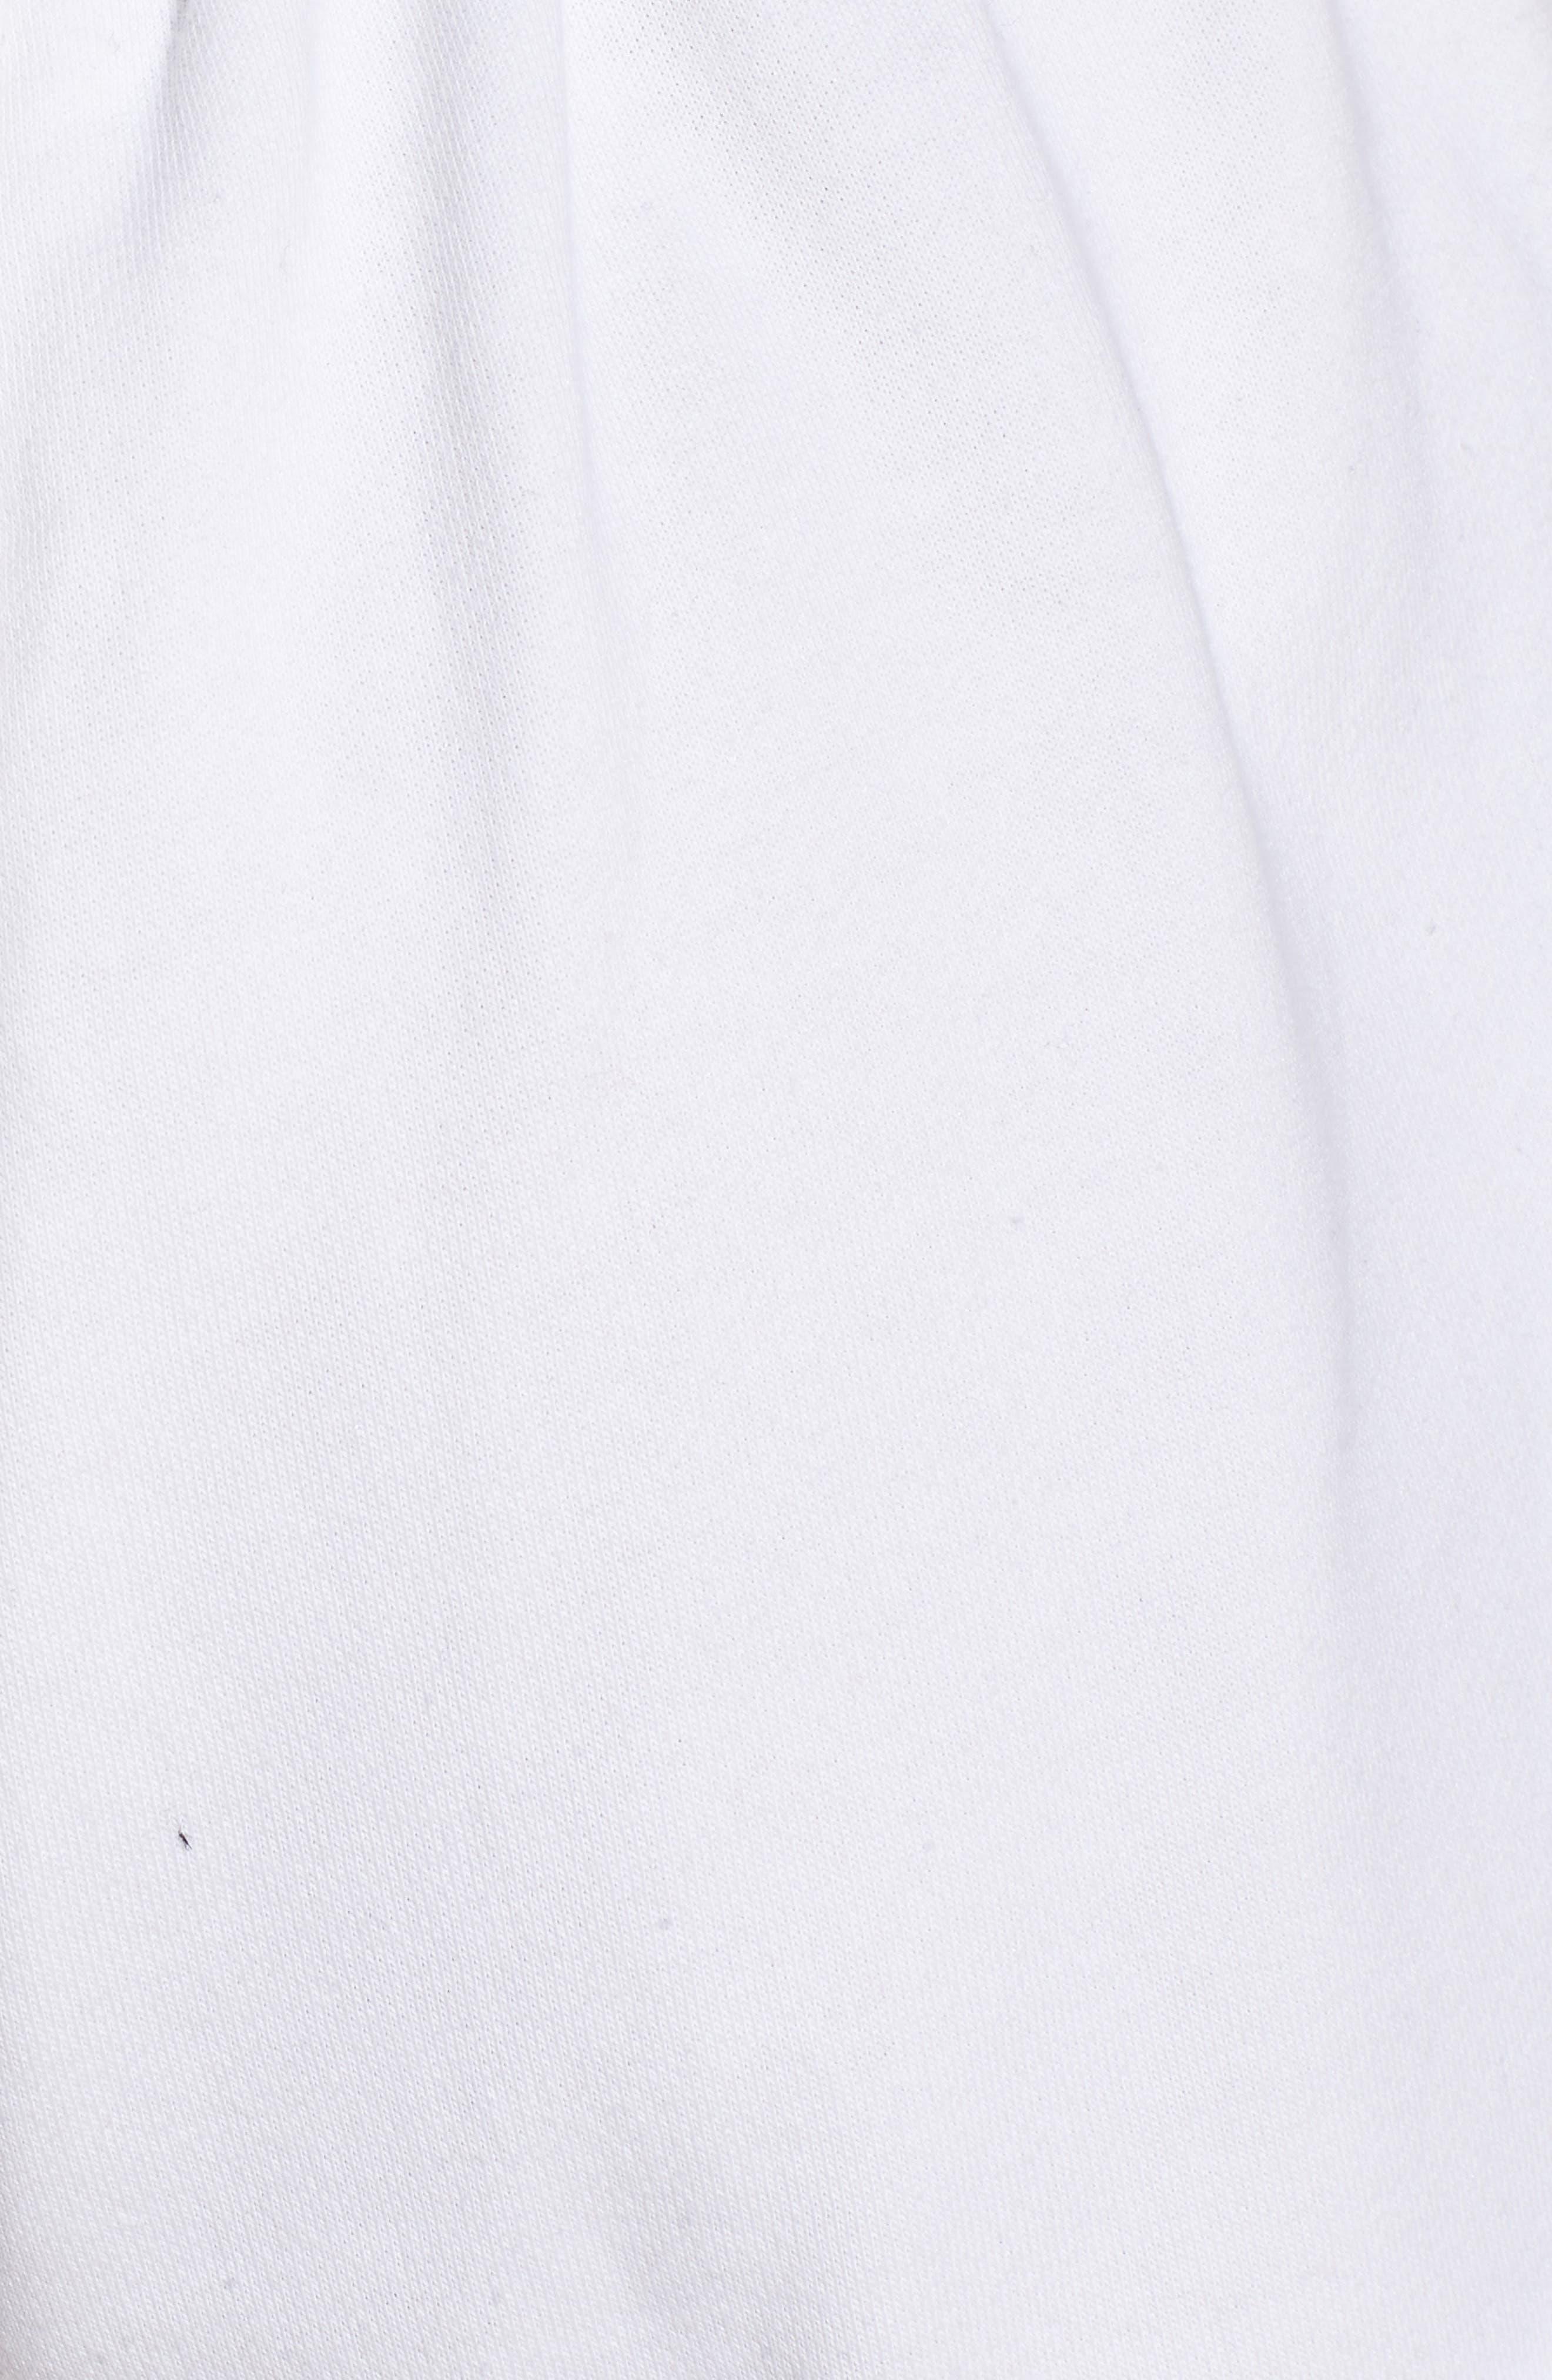 Rolled Drawstring Shorts,                             Alternate thumbnail 5, color,                             Bright White